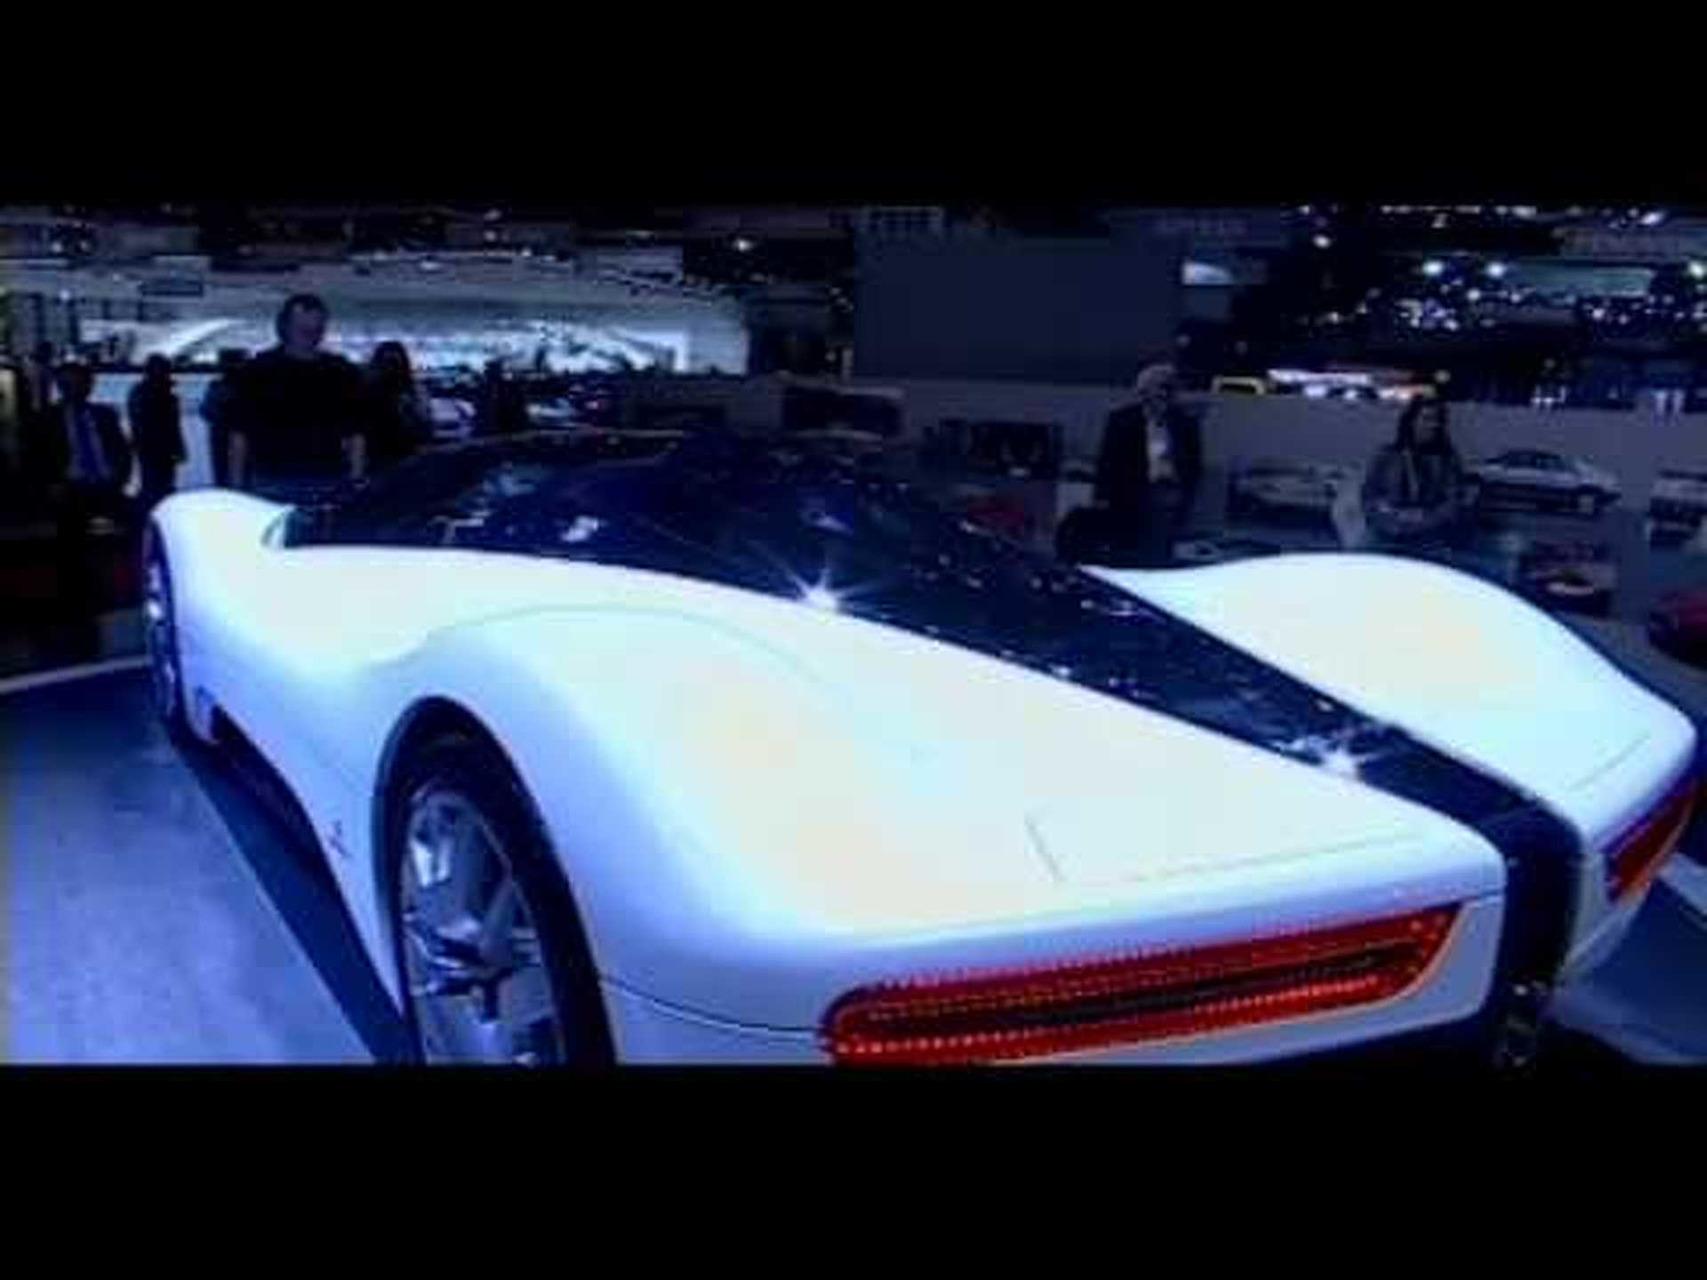 Maserati Birdcage - Dream Cars